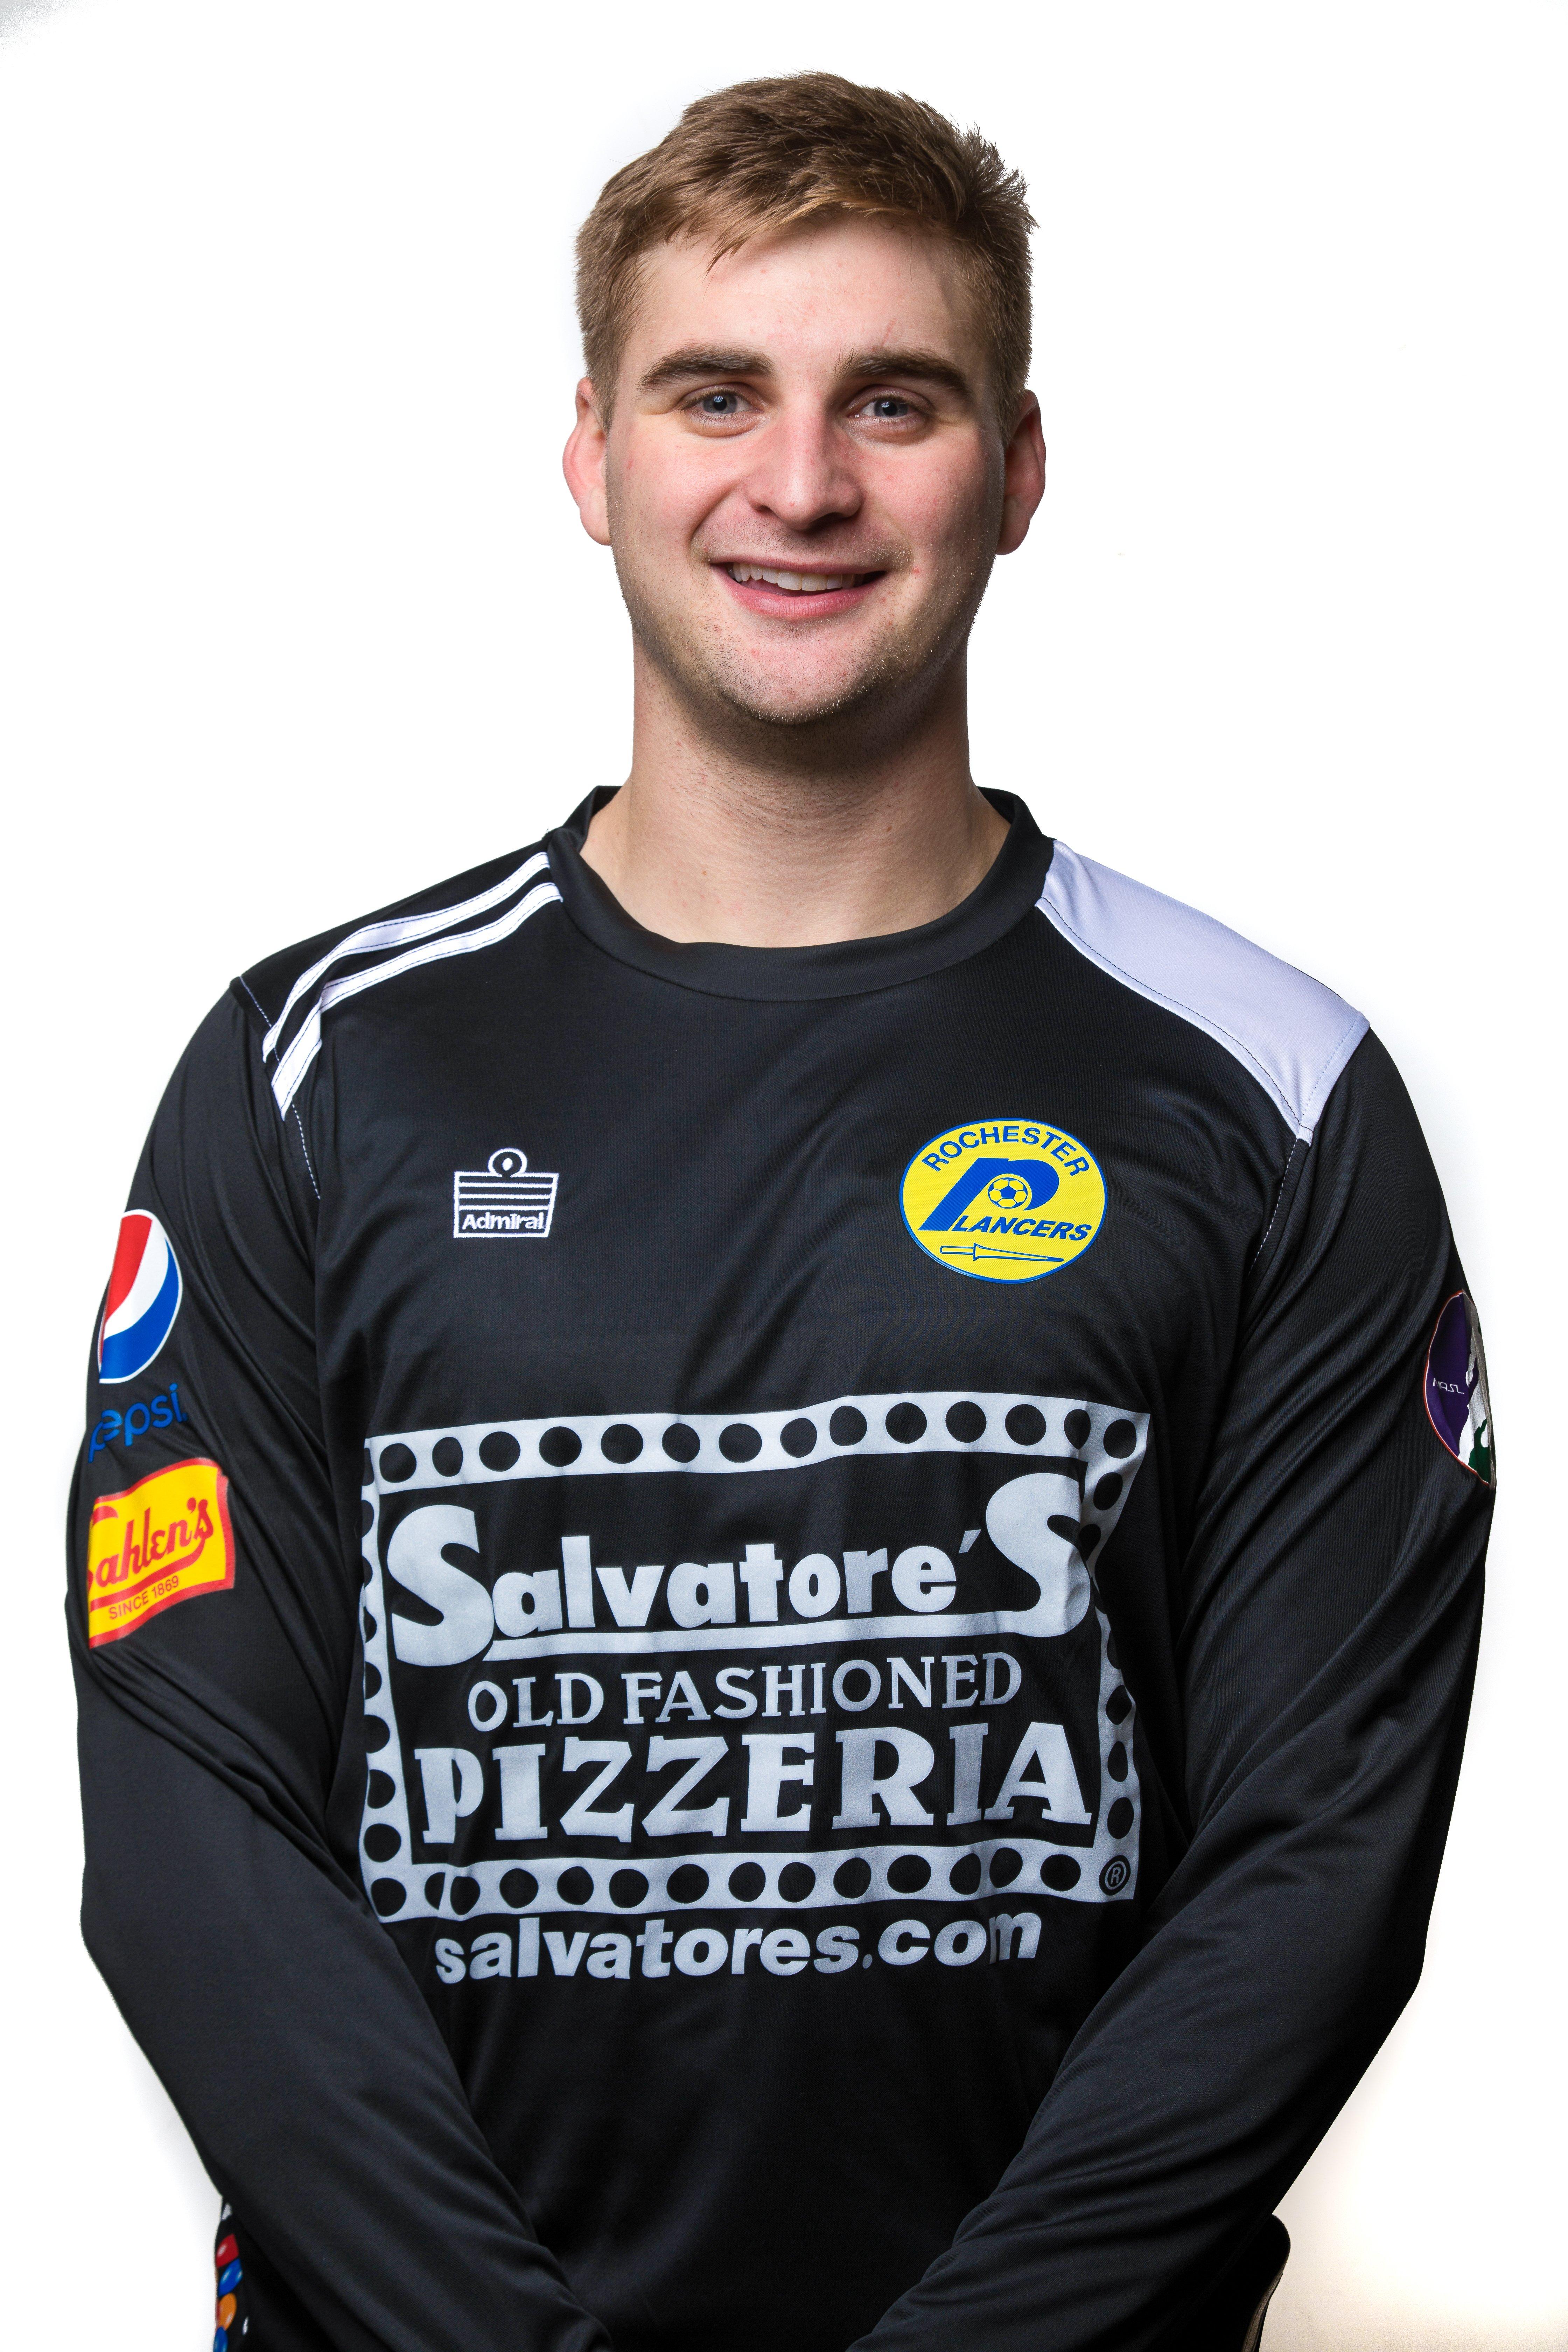 Christian Esposito